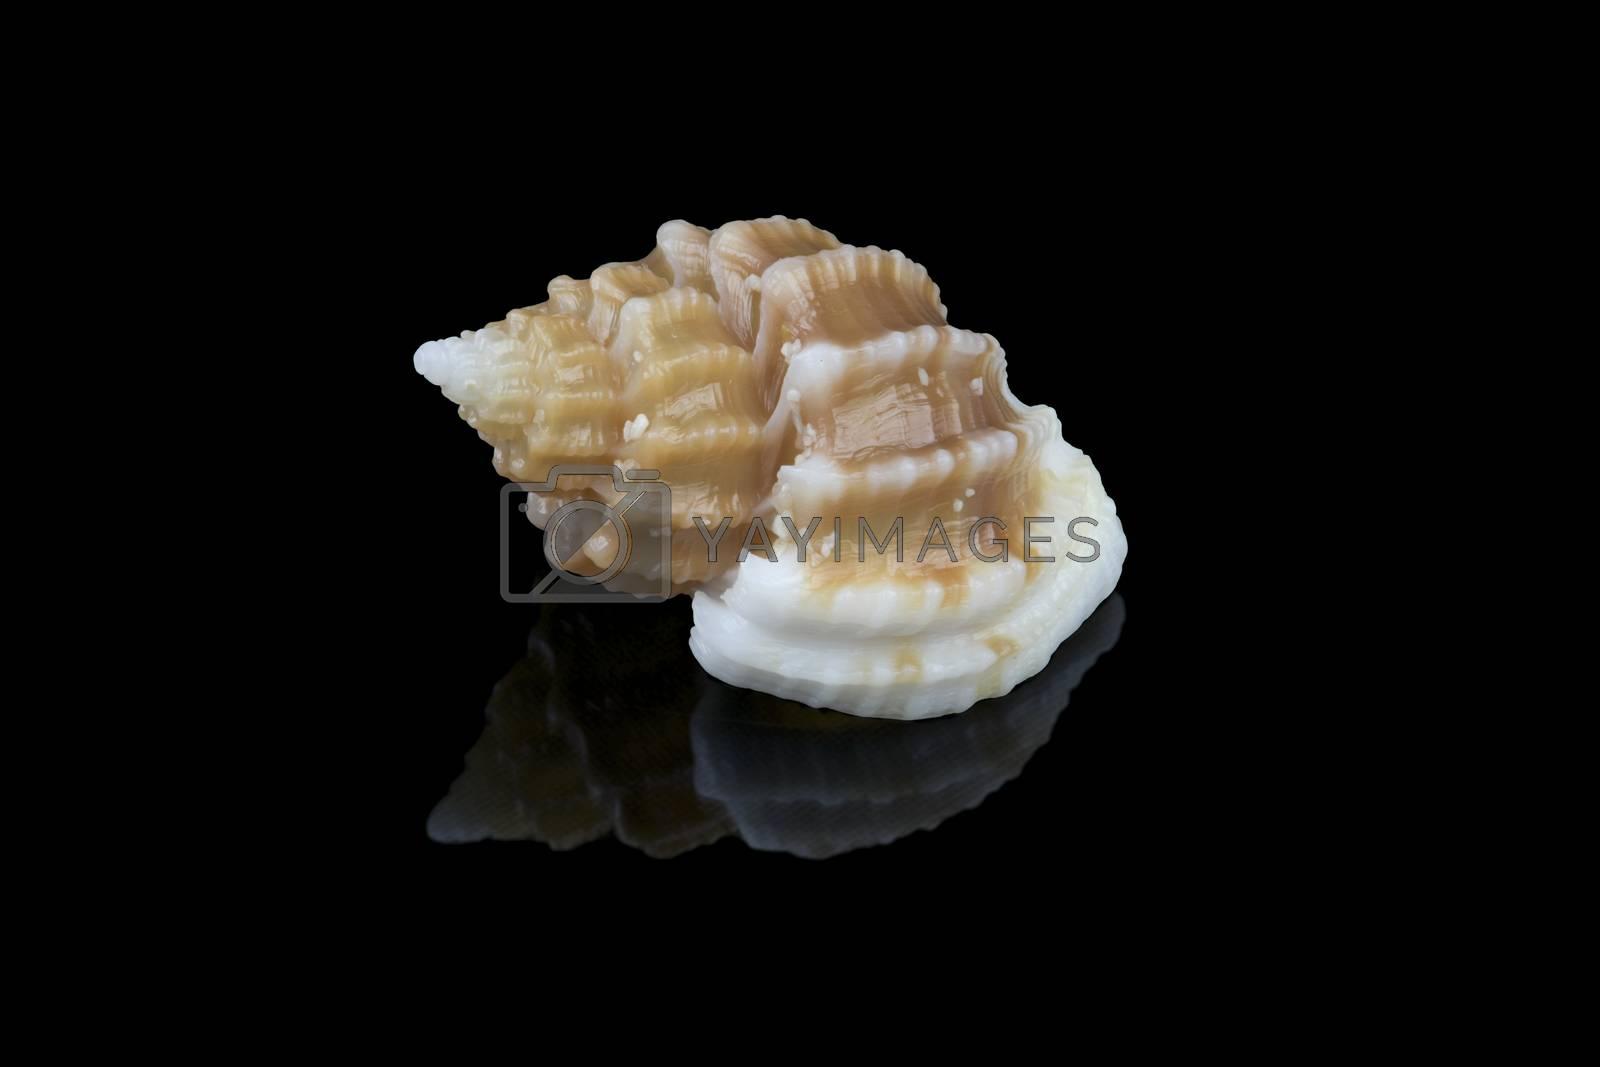 Shell of Scalptia bicolor or Trigonostoma bicolor on black background. It is a marine gastropod mollusk in the family of Cancellariidae, genus of sea snails. L1,8xW1,2x0H0,9 cm